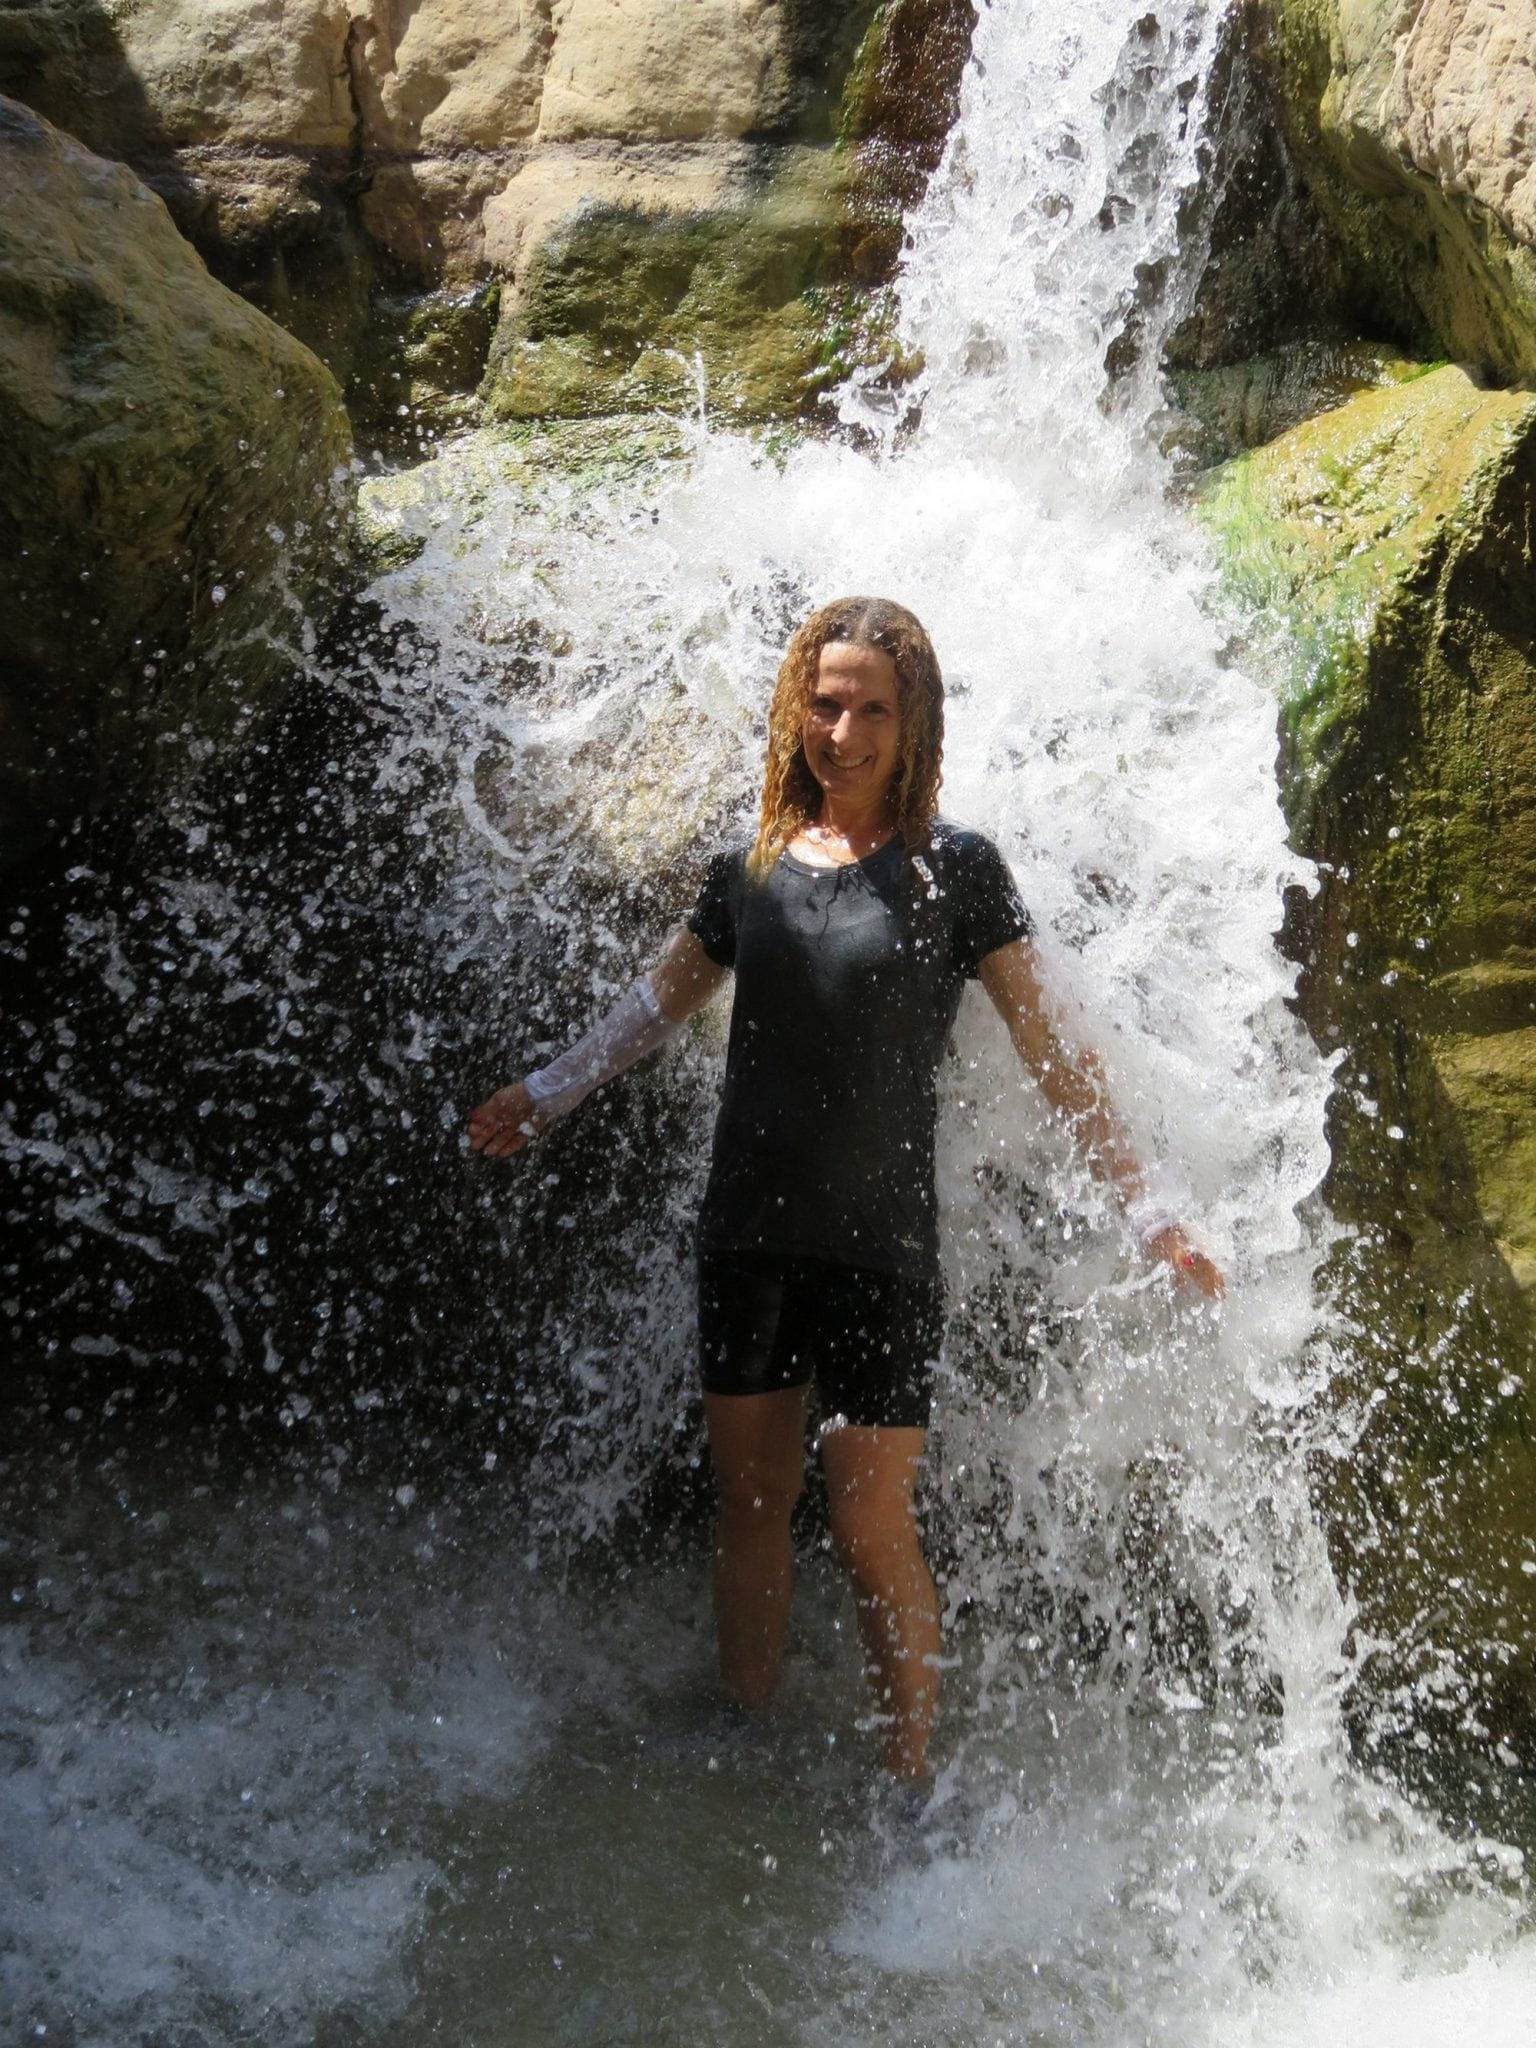 Wadi-Ghuweir, טיול בירדן, מטיבי לכת, ערוצים בטבע